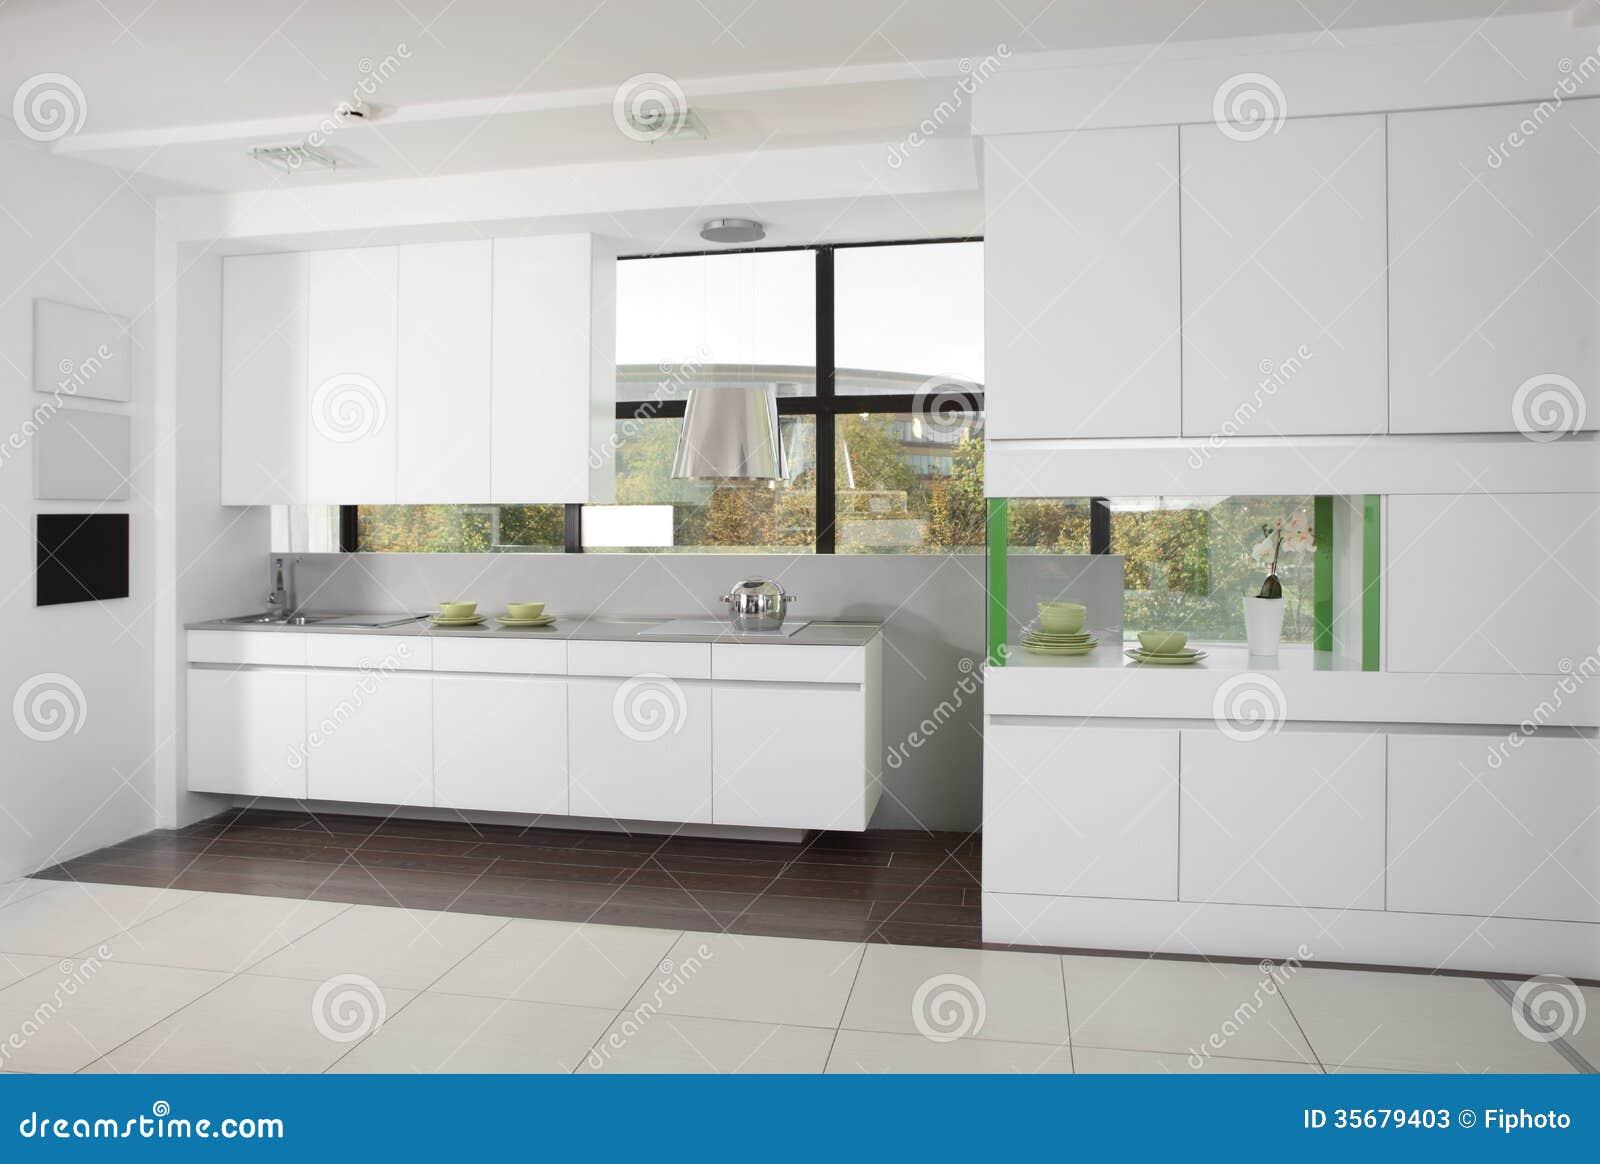 Moderne Keuken Lampen : Moderne keuken met modieus meubilair stock afbeelding afbeelding